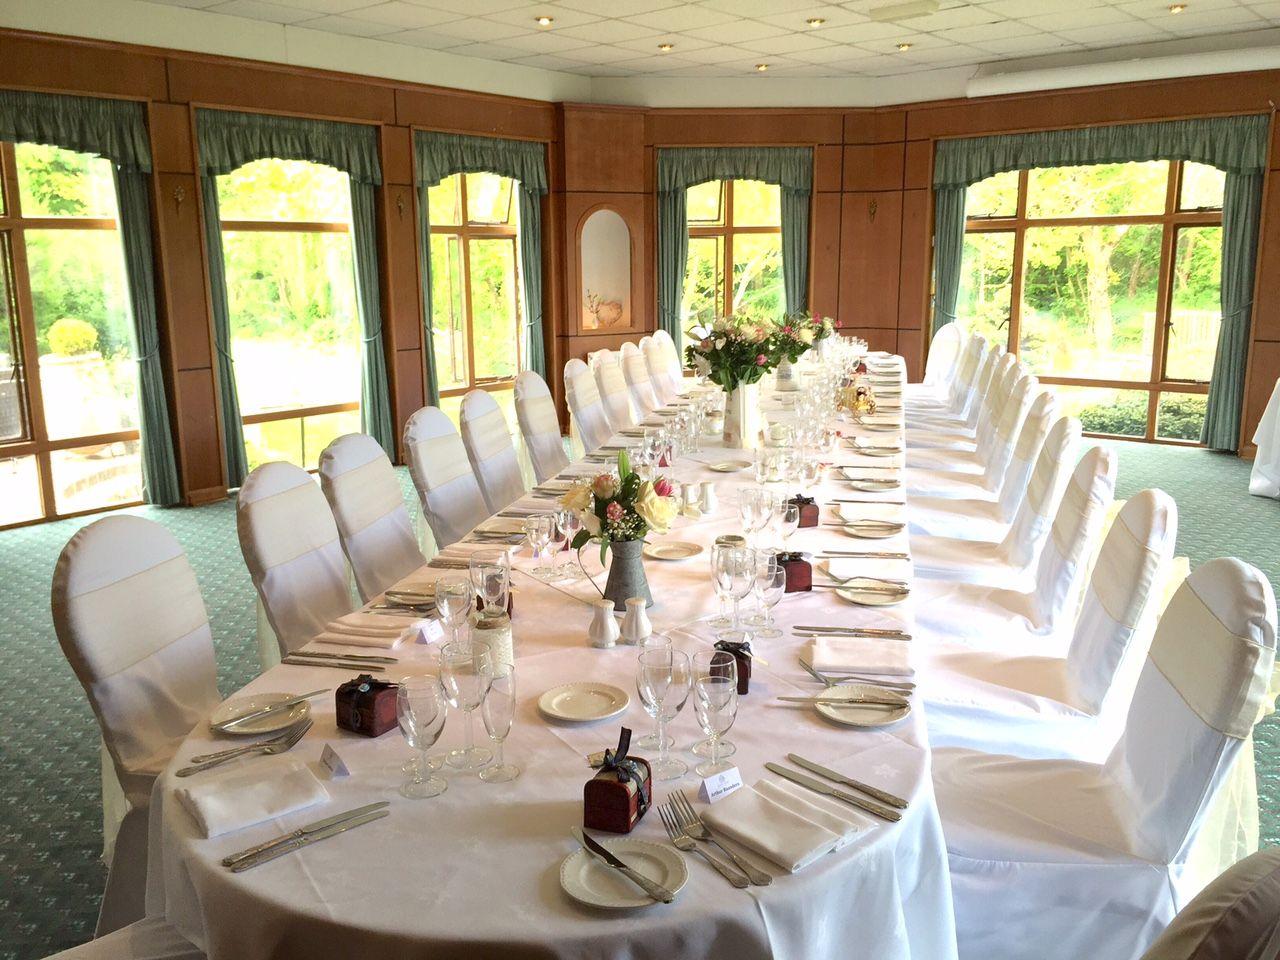 Wedding Venue in East Sussex, Lewes and Brighton Area